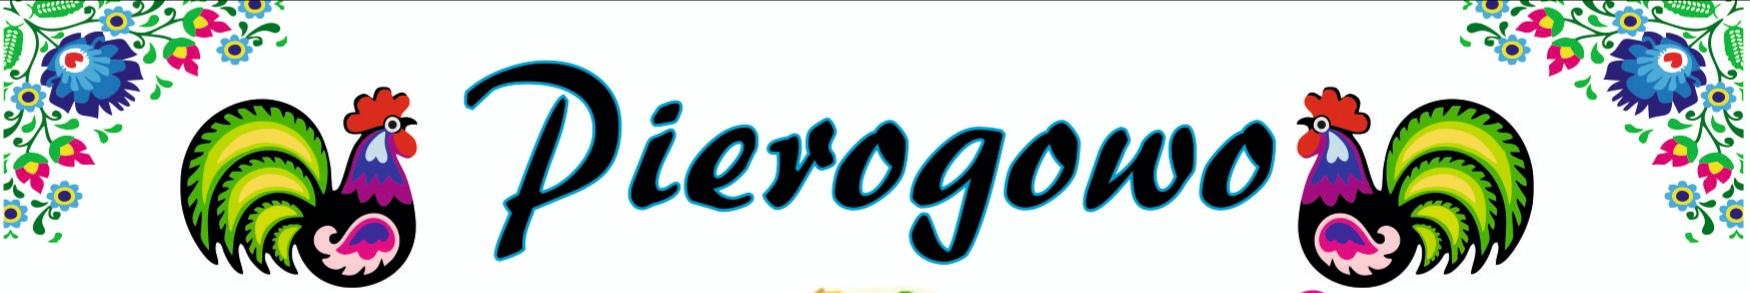 Logo Pierogowo